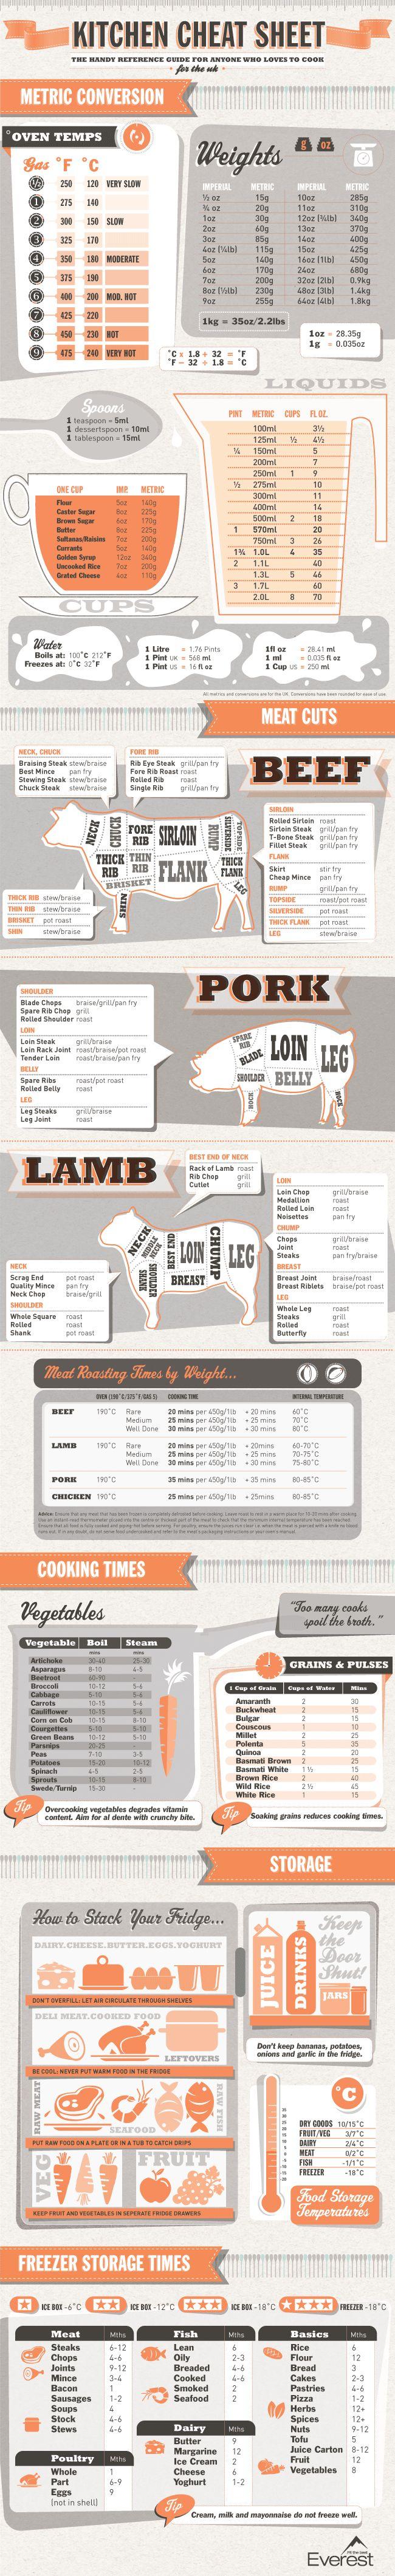 Kitchen Cheat Sheet - printing